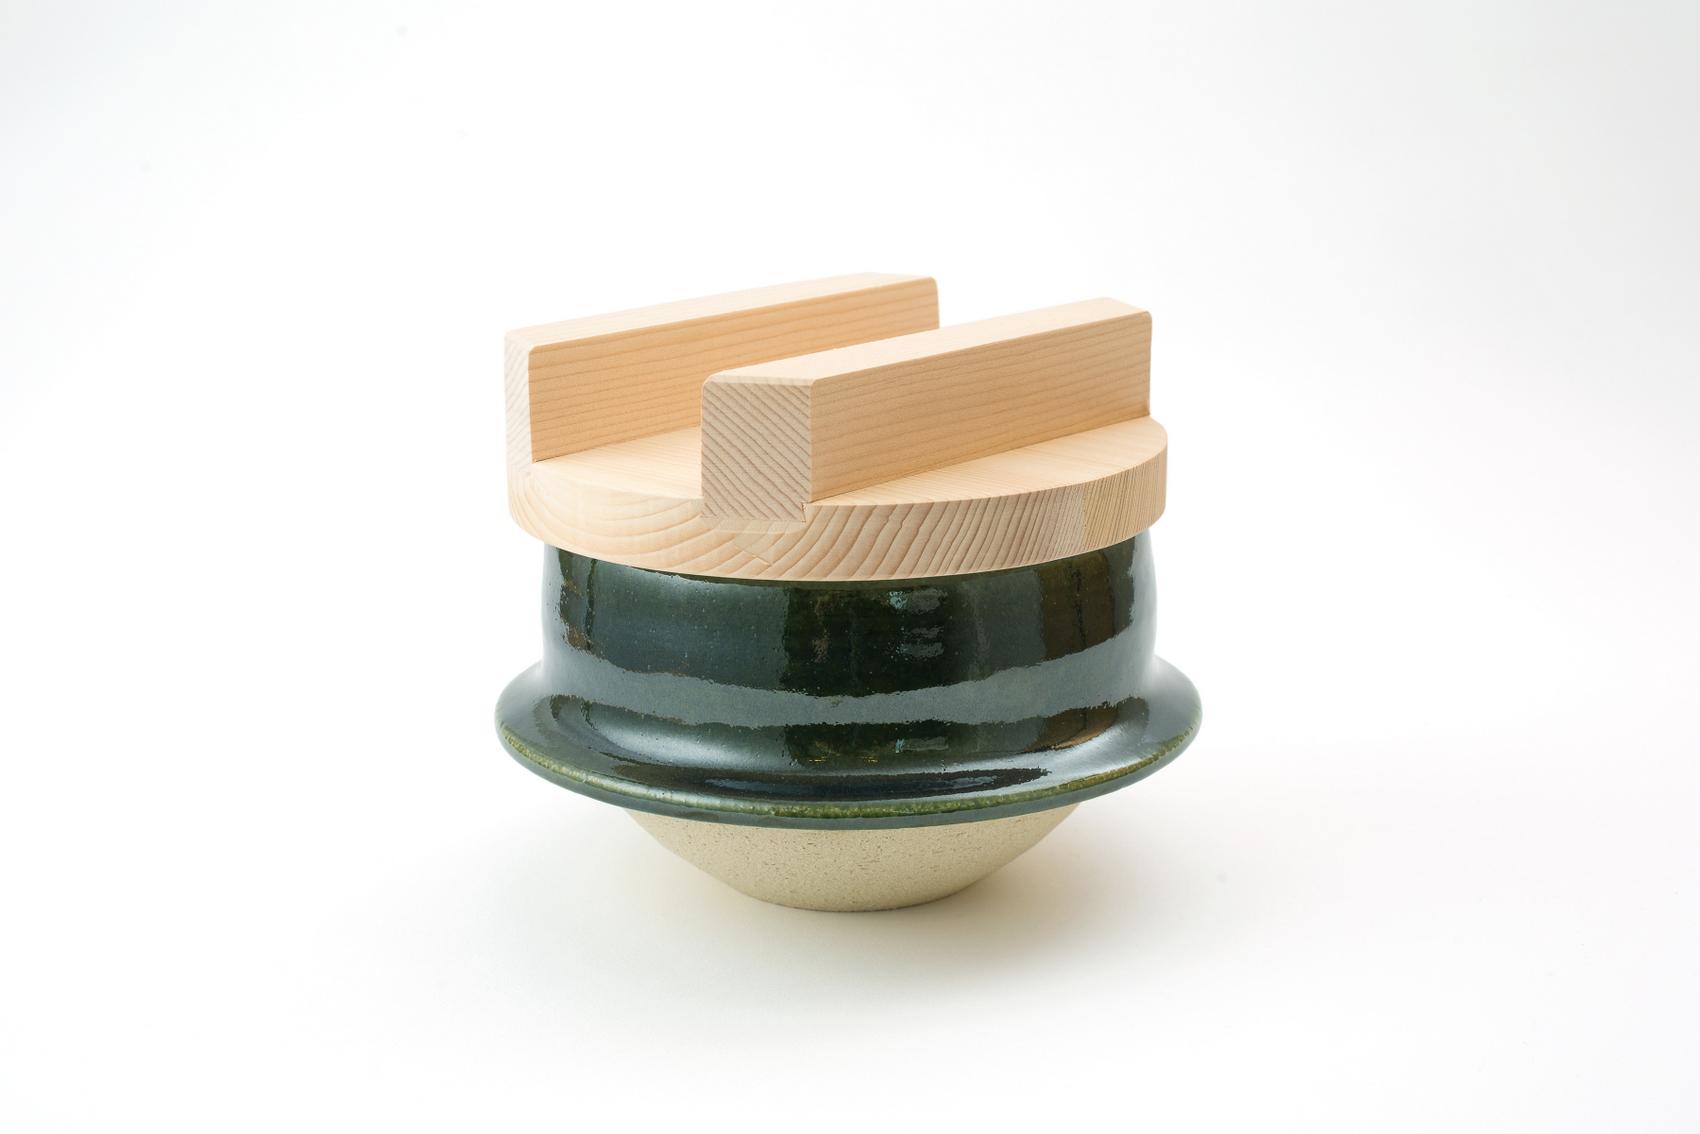 土楽・織部羽釜6寸(3合炊き)